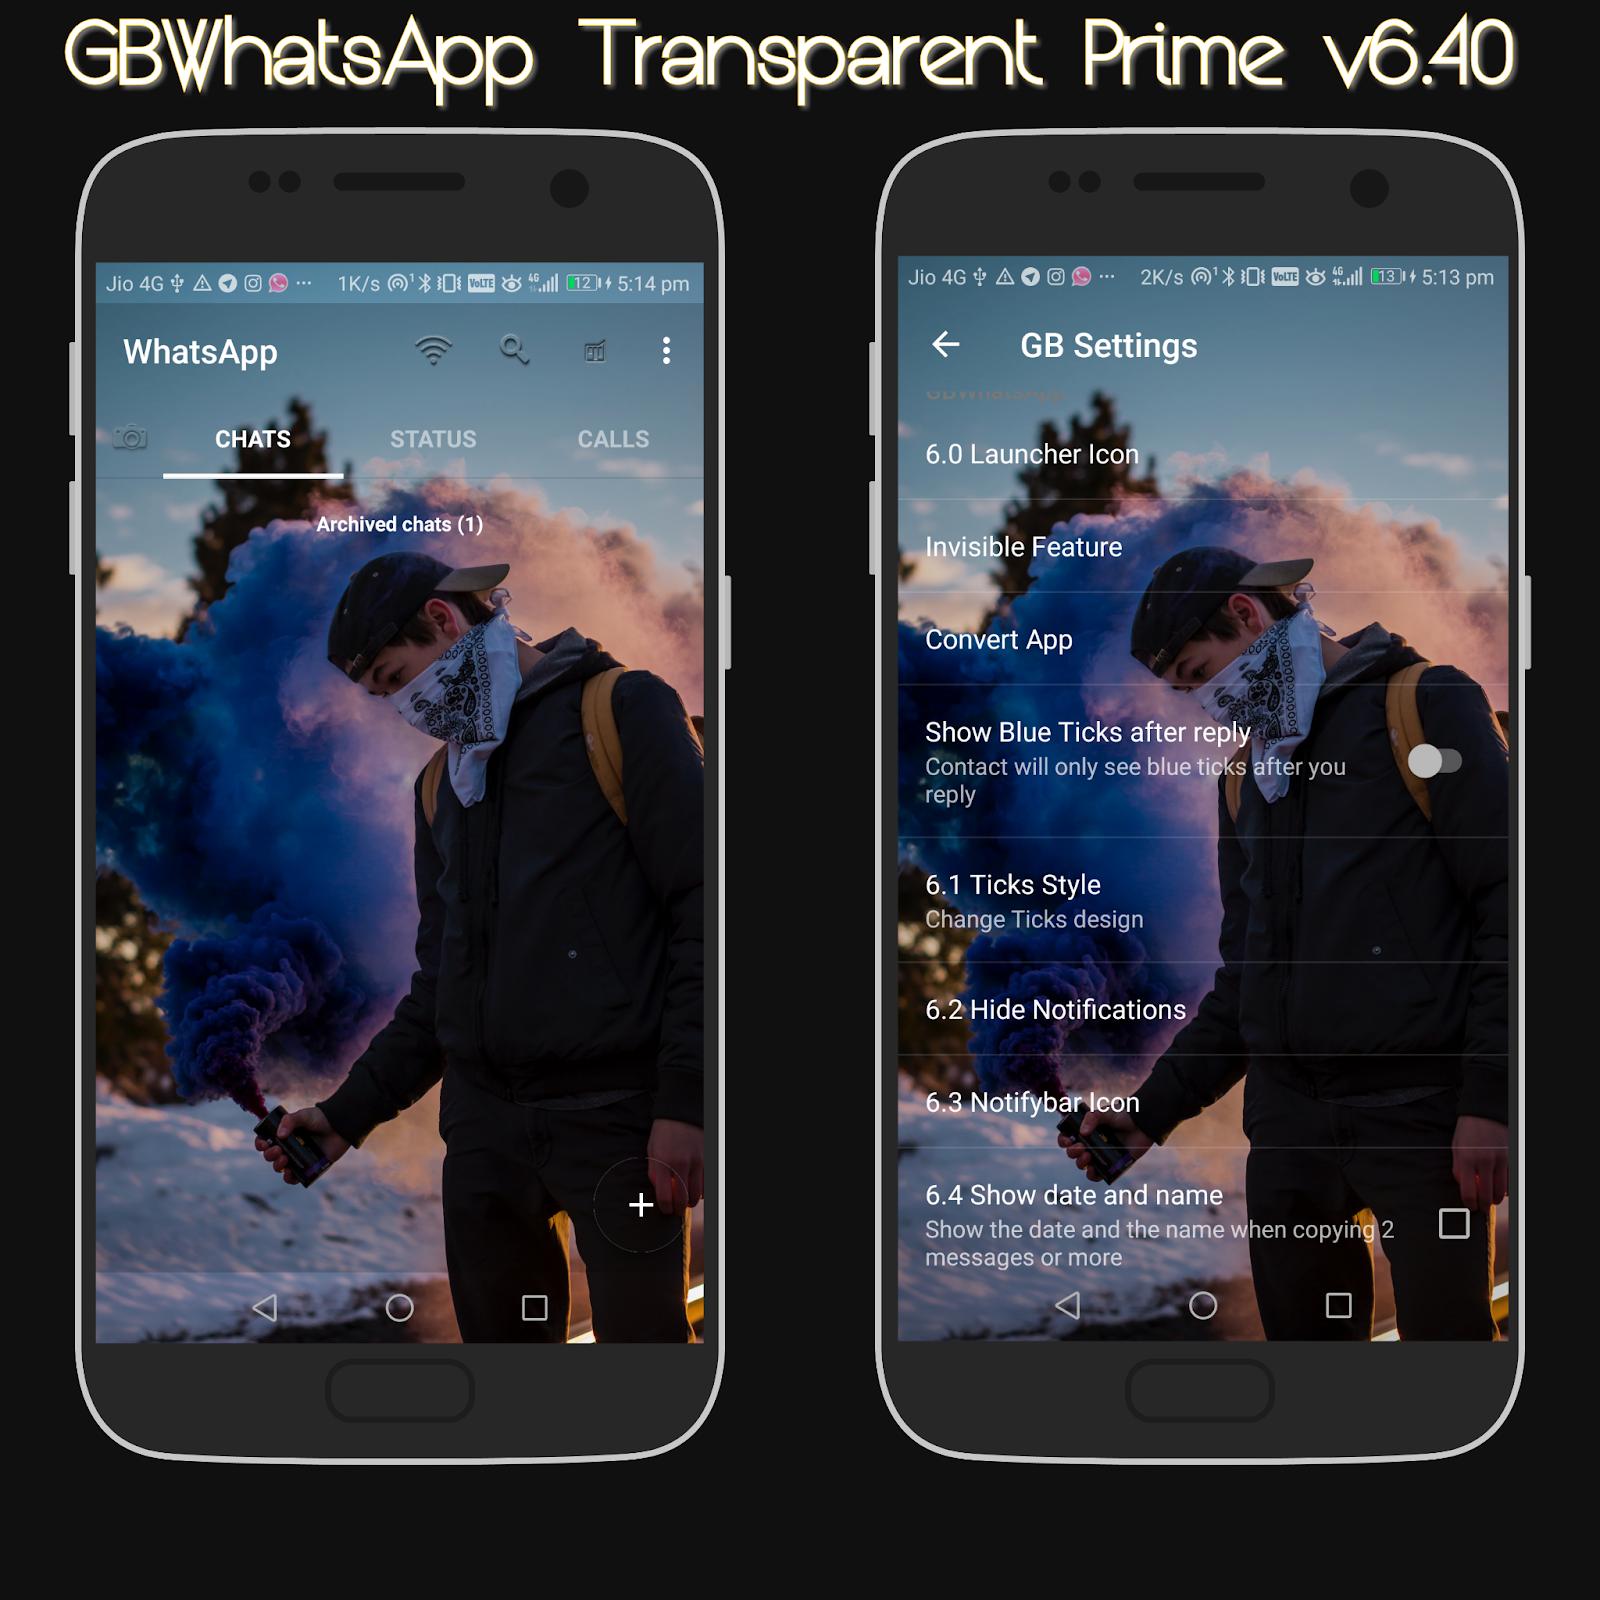 💌 Download whatsapp transparente 2019 | Download GBwhatsApp 2019